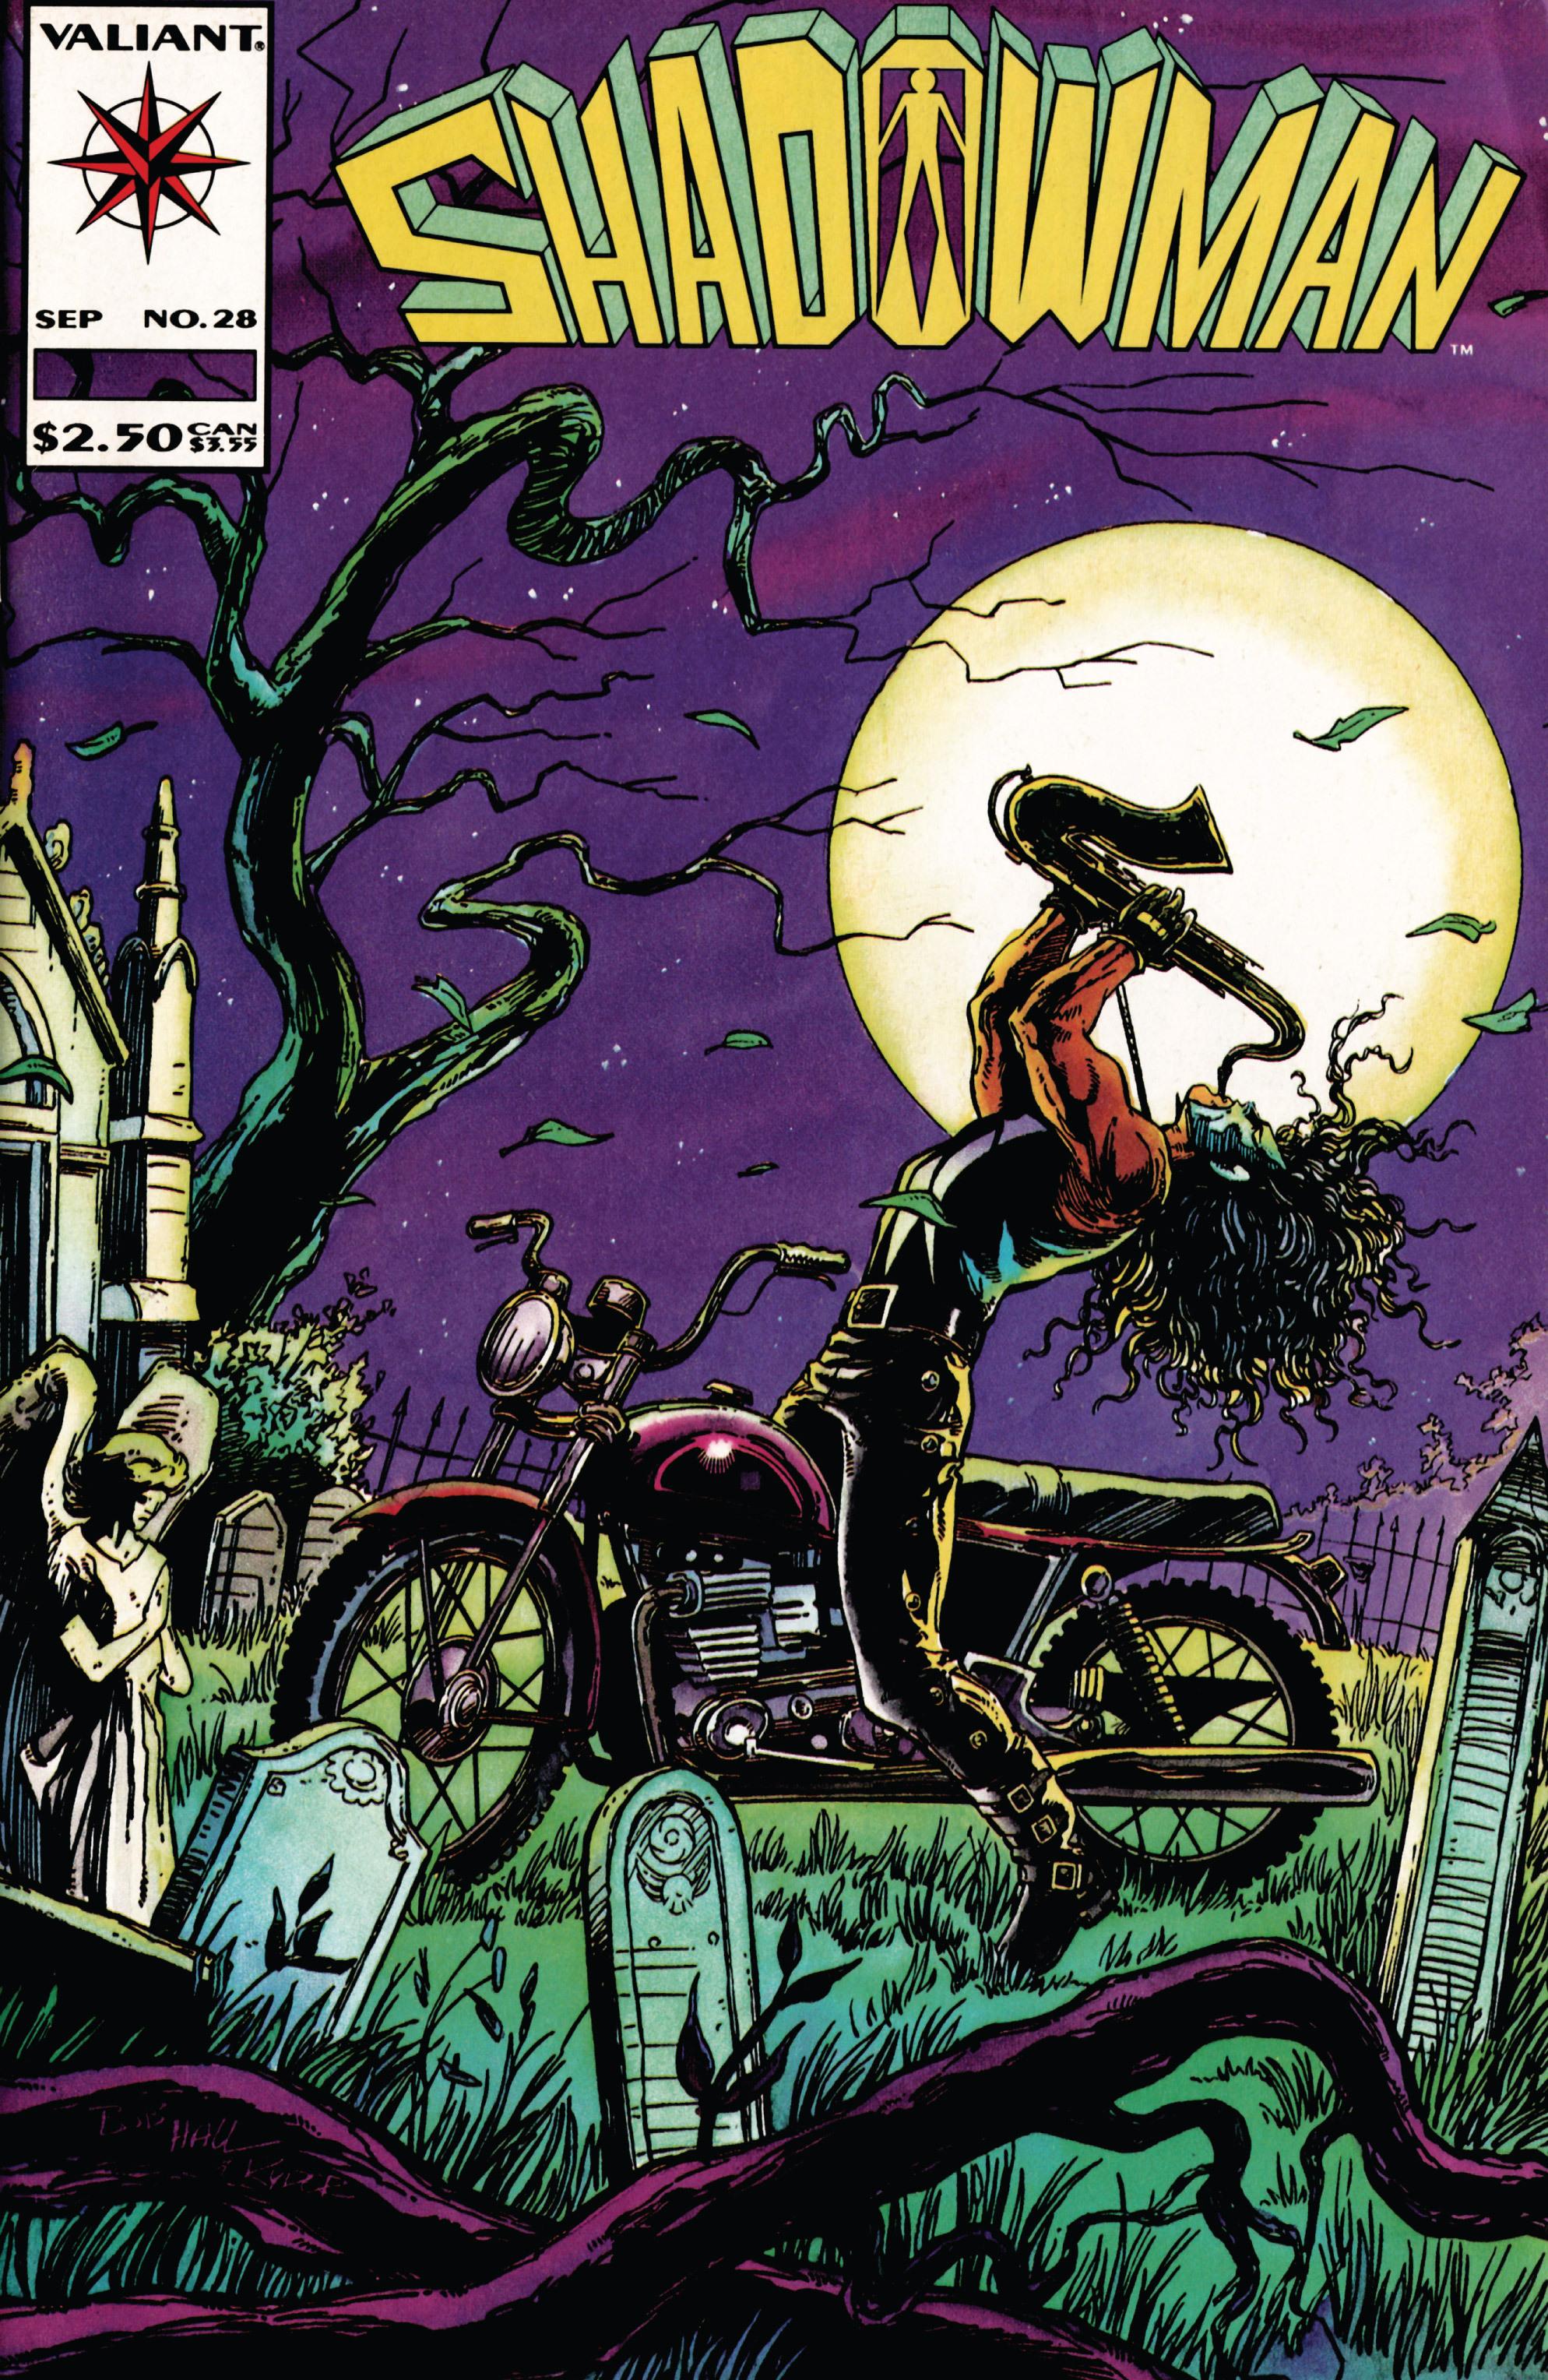 Read online Shadowman (1992) comic -  Issue #28 - 1